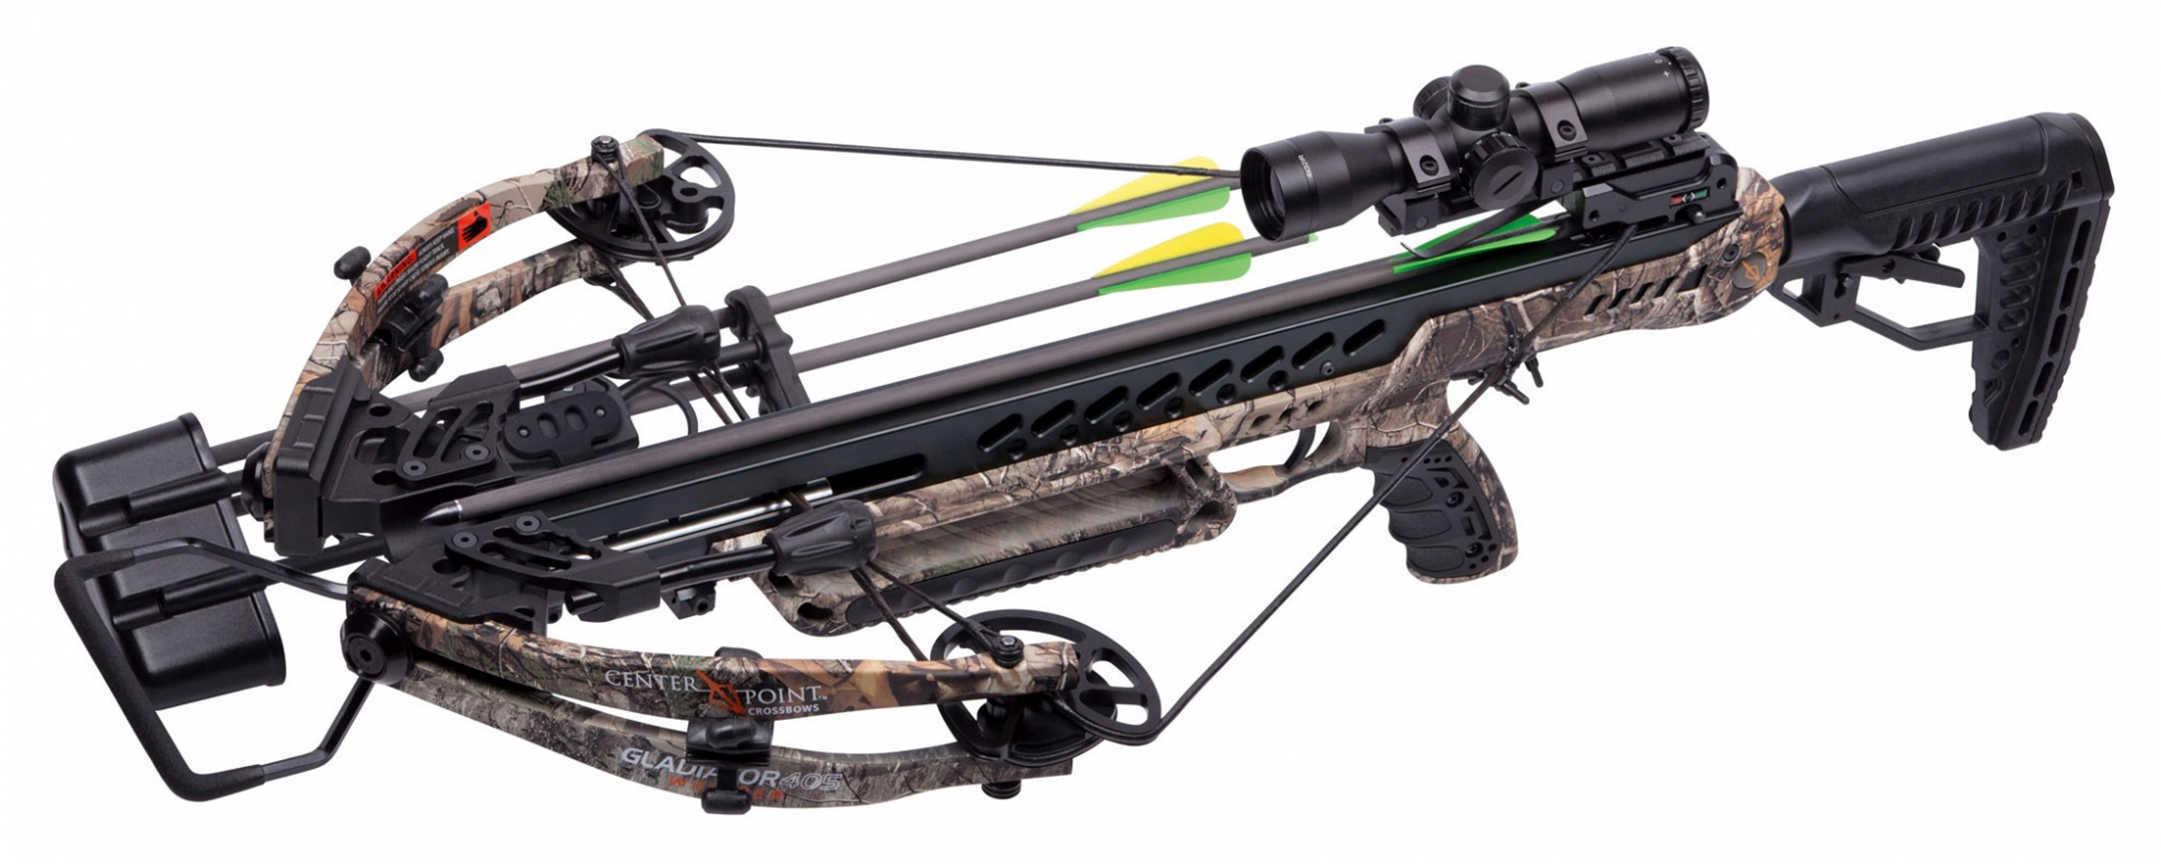 Crosman Gladiator Whisper 405 Crossbow, 200 lb Draw Weight, Realtree Xtra Md: AXCG200CK2